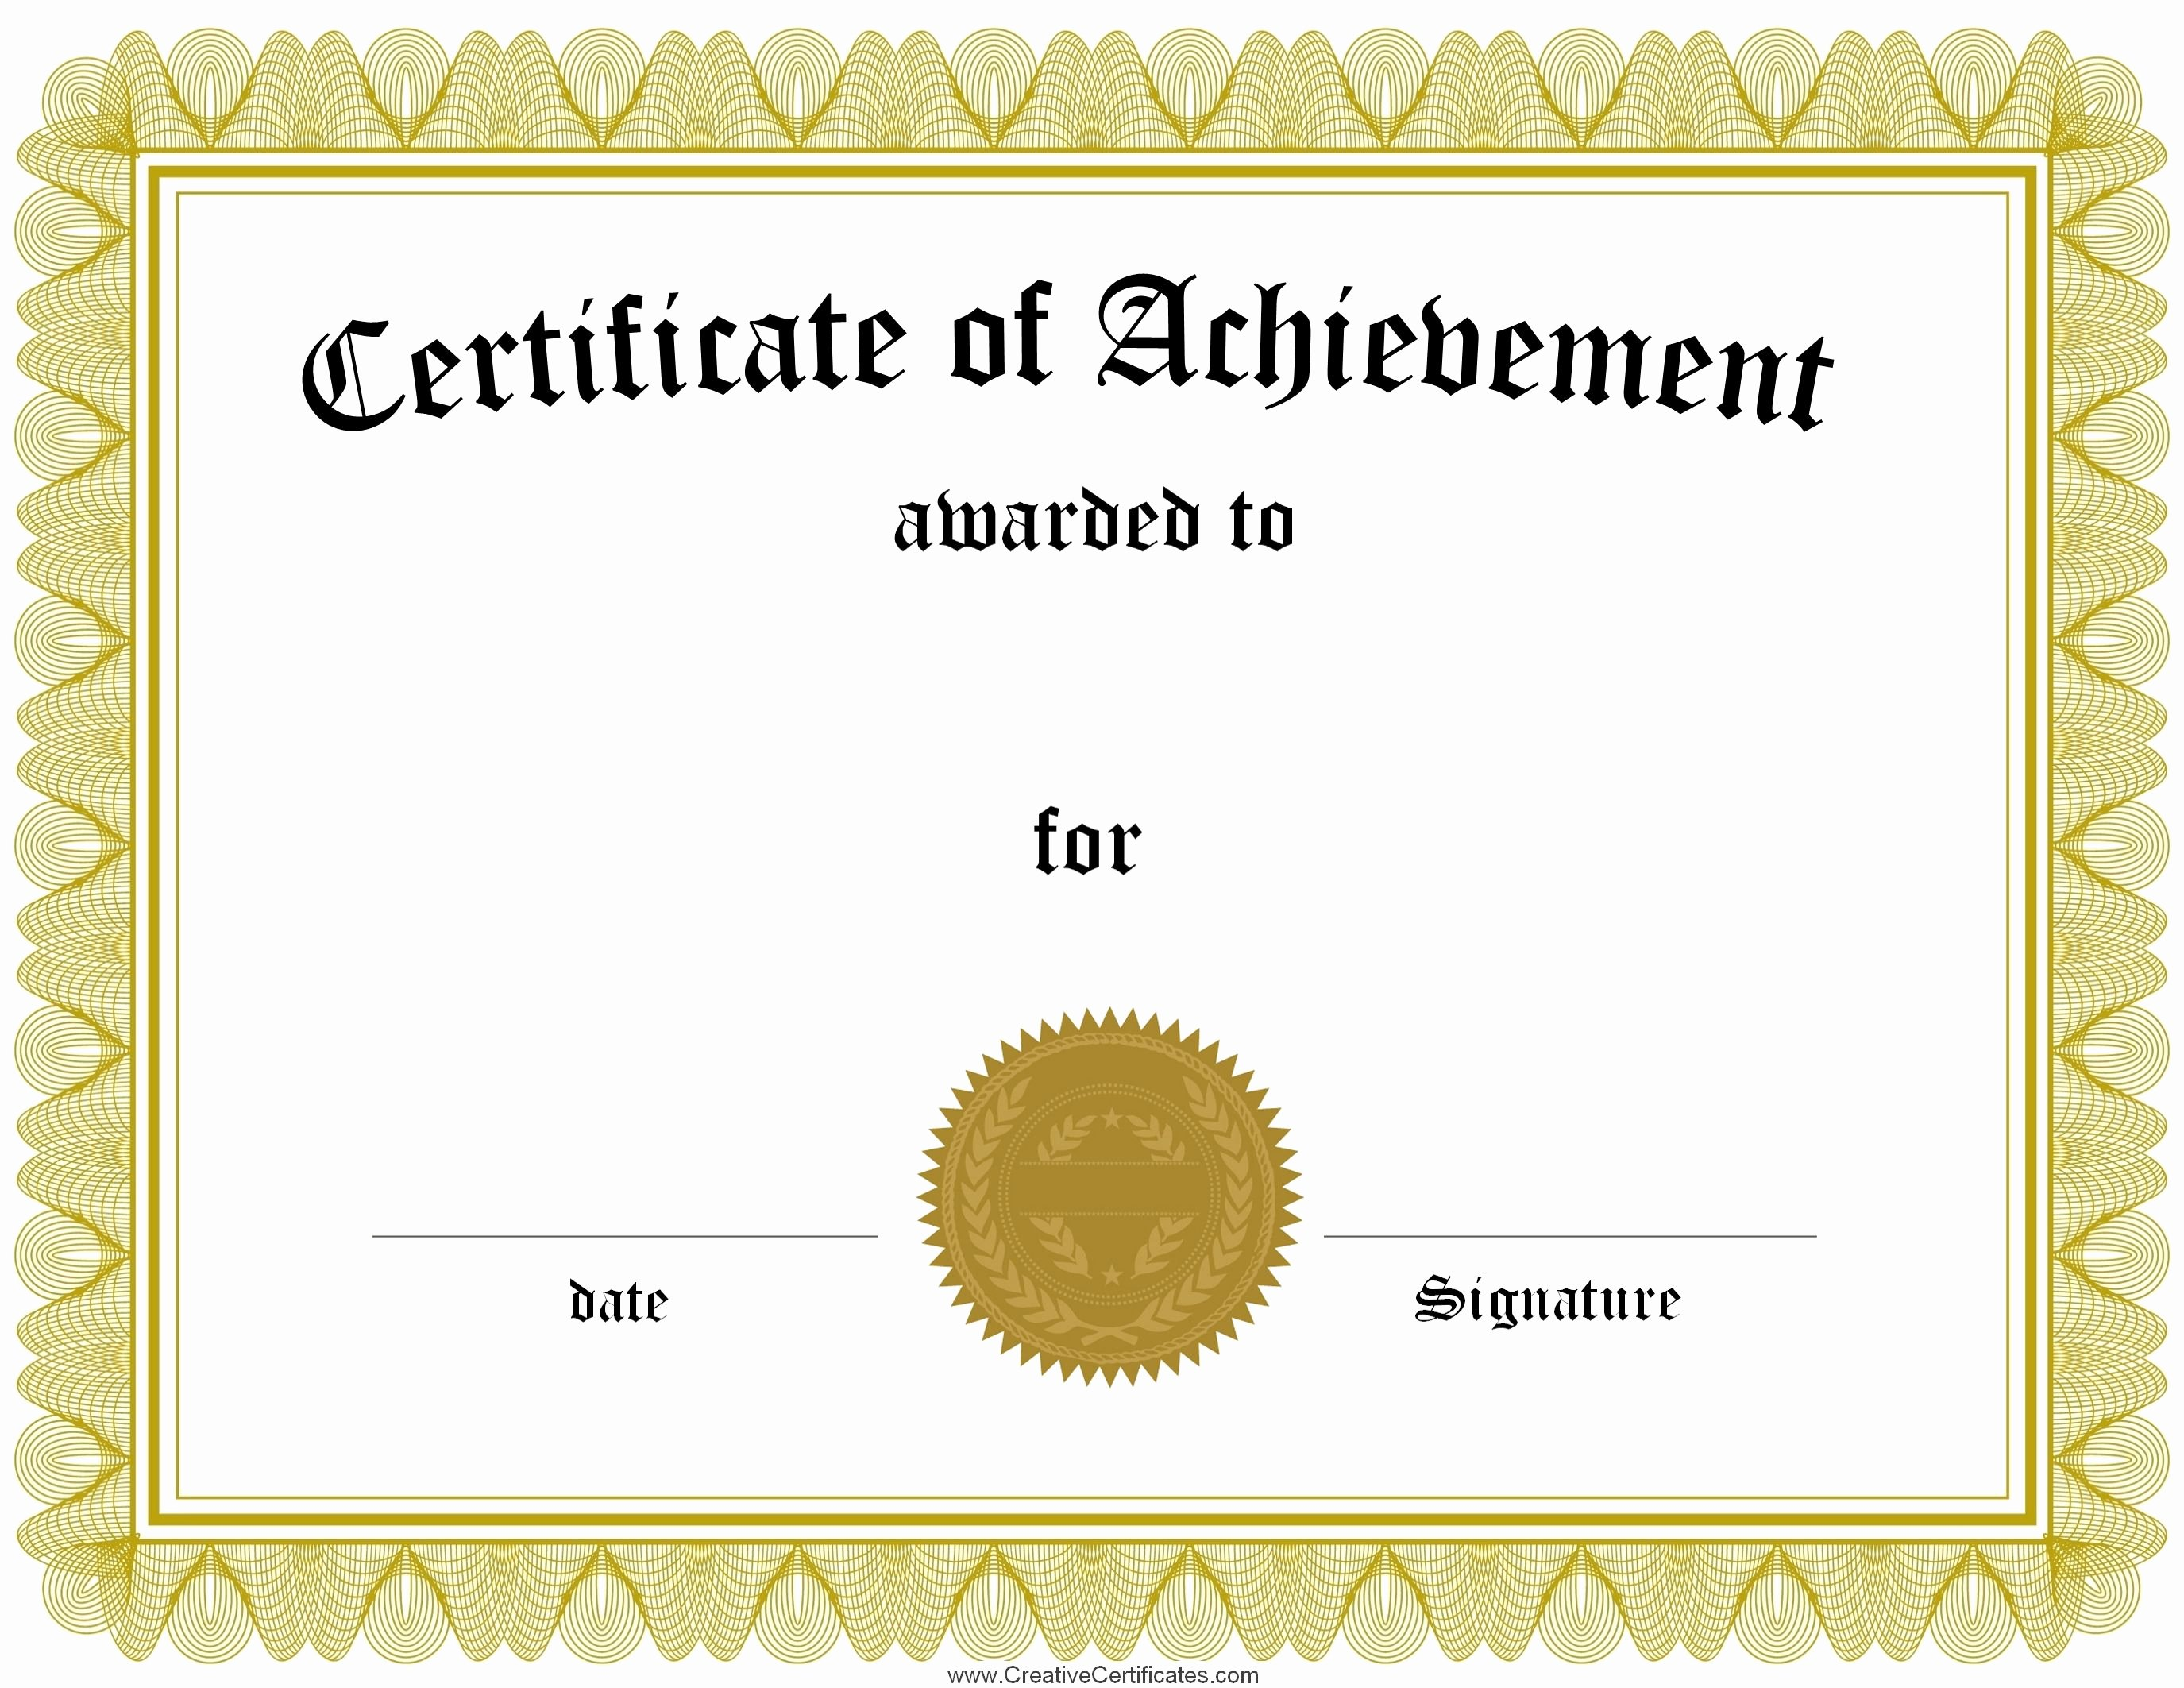 Scholarship Awards Certificates Templates Beautiful Award Certificate Template Certificate Templates Best Free Images Yugcsw3j